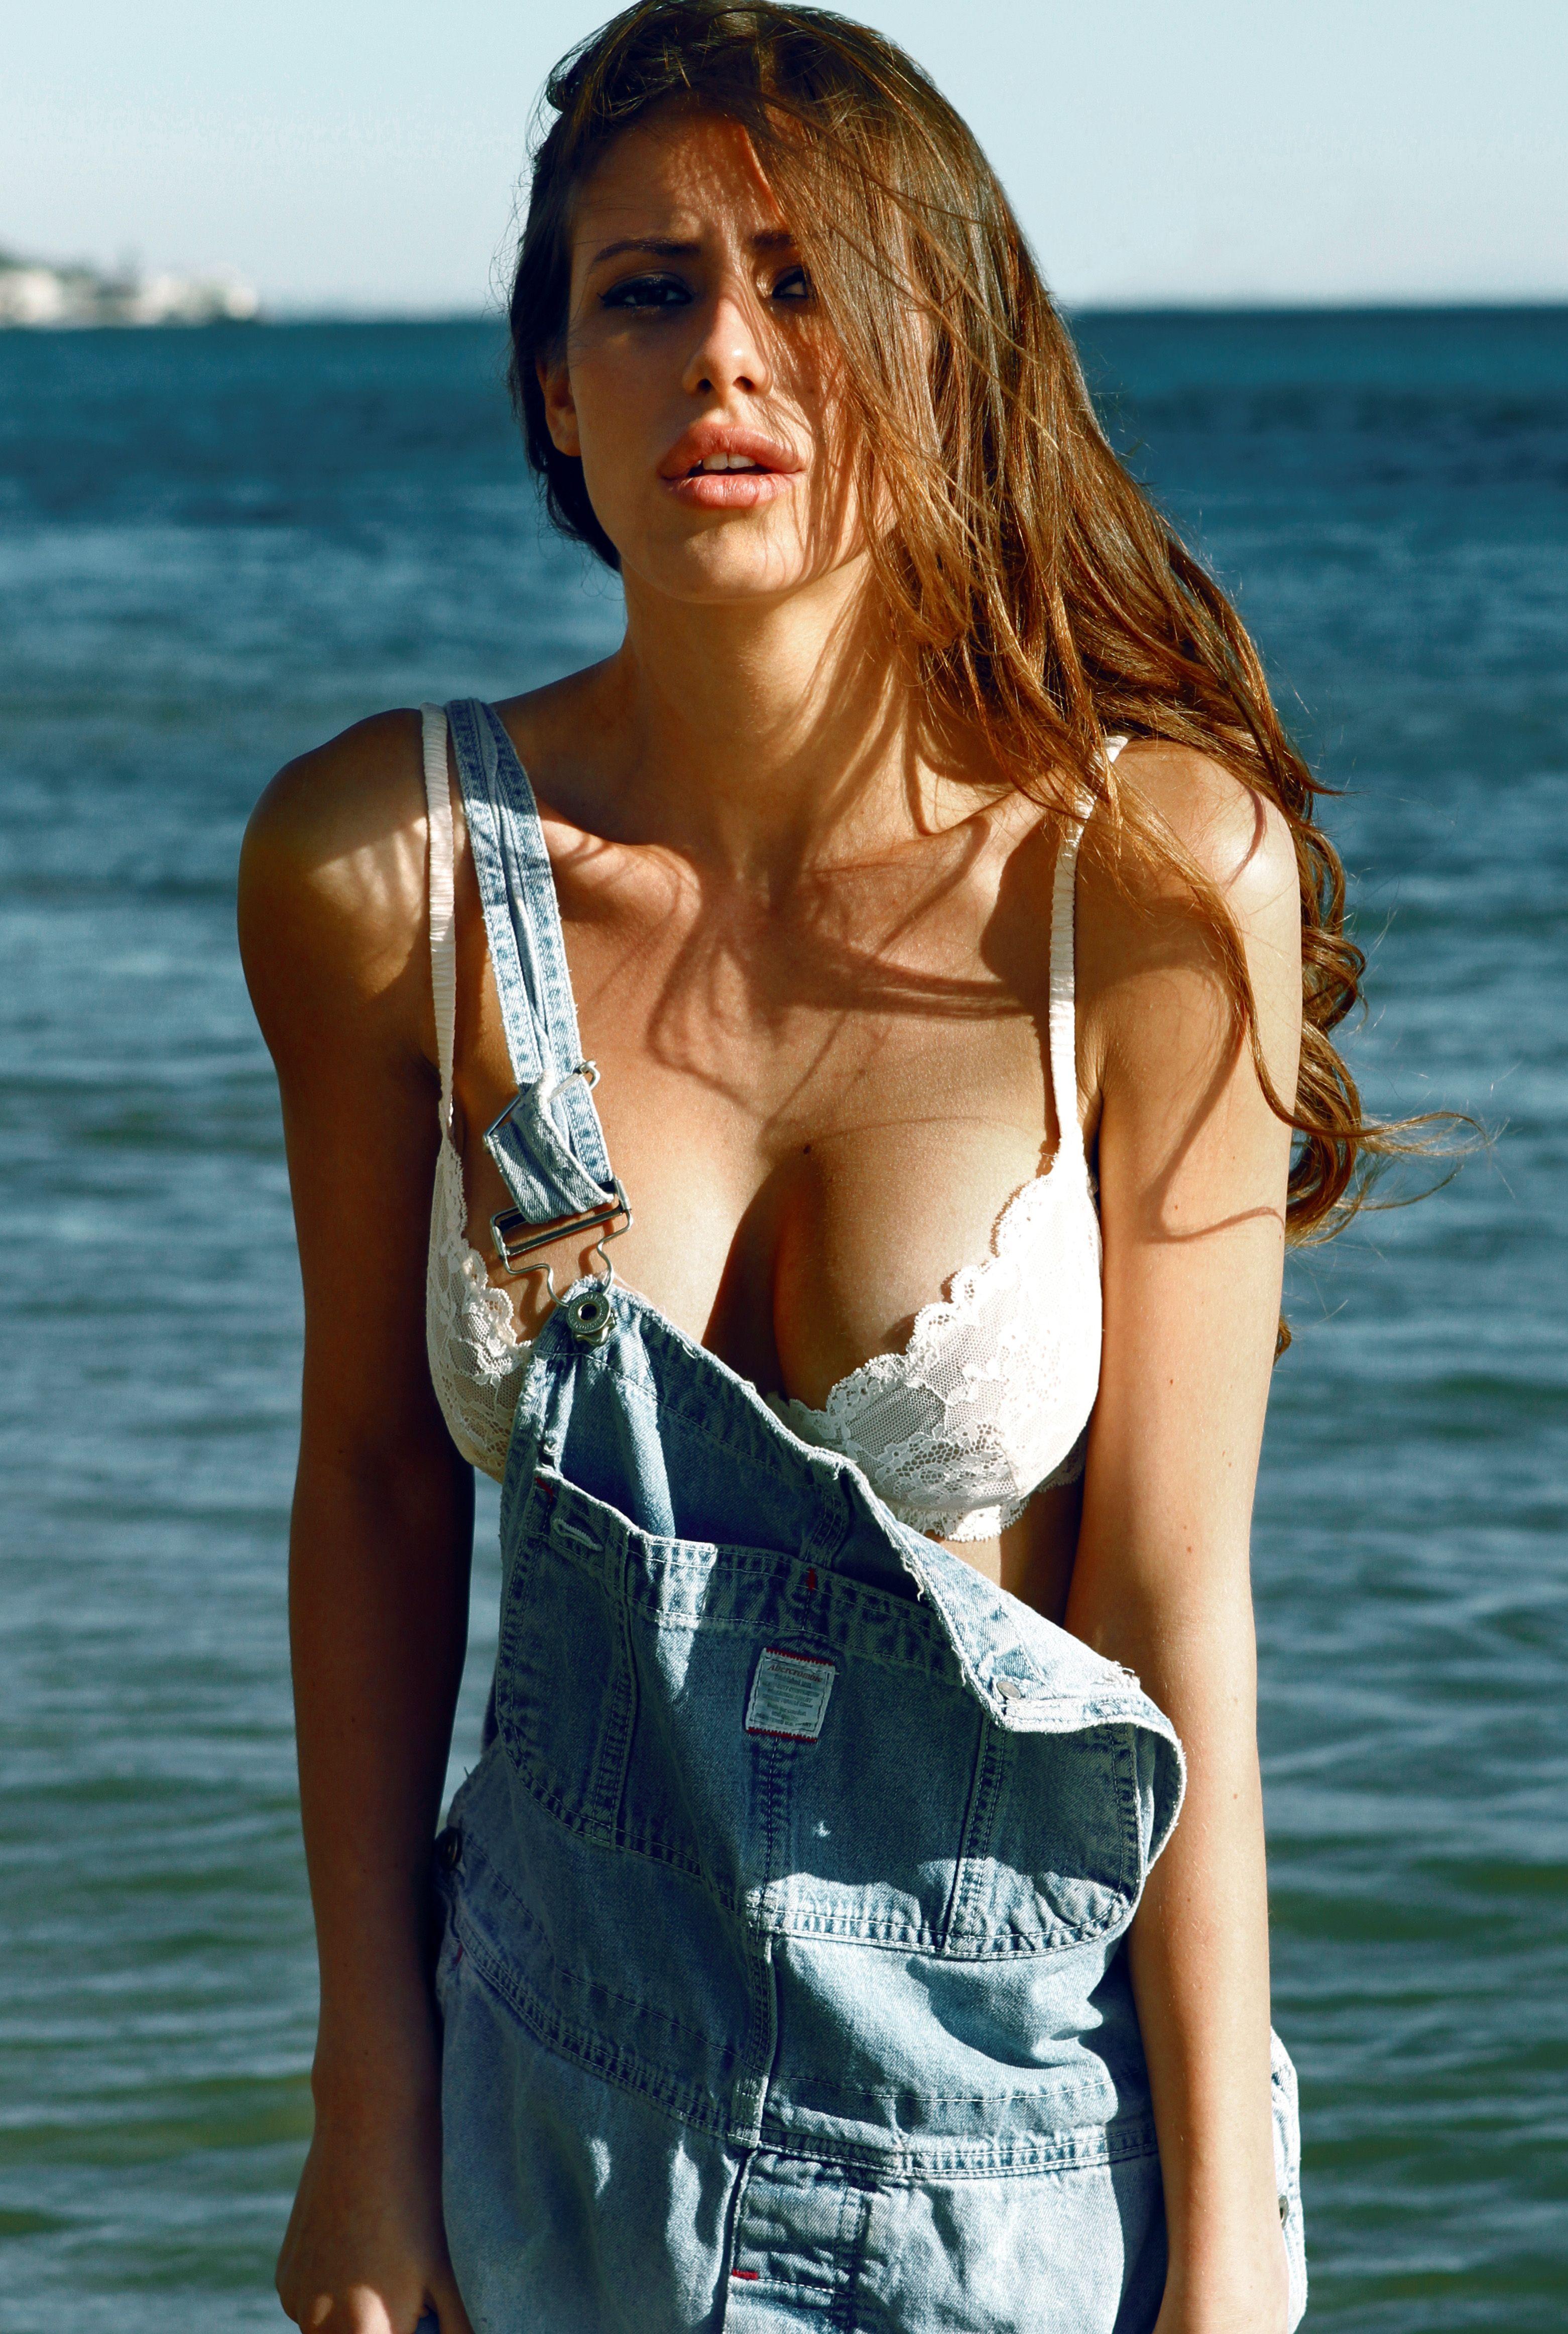 Hot Anna Alisher nudes (75 photos), Ass, Bikini, Twitter, legs 2017